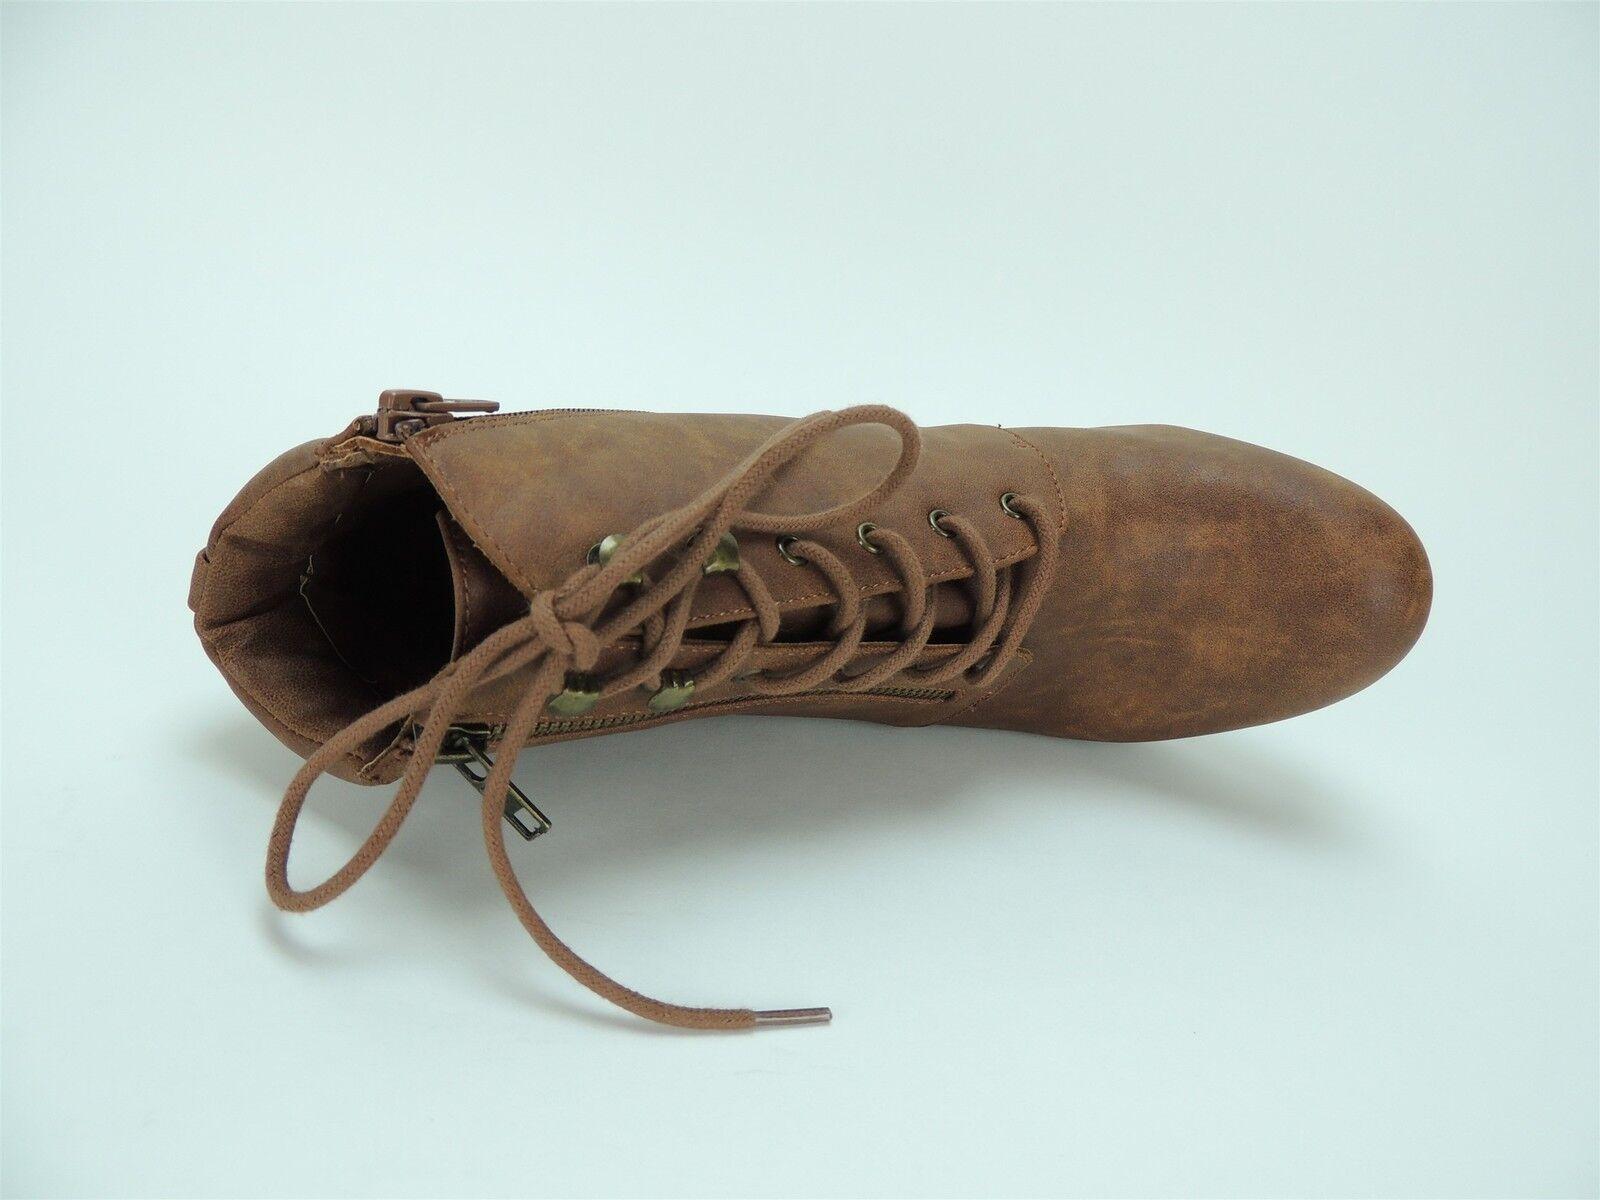 Material Girl Women's Rheta Lace-Up Platform Boots - Booties Cognac Size 10.5 M